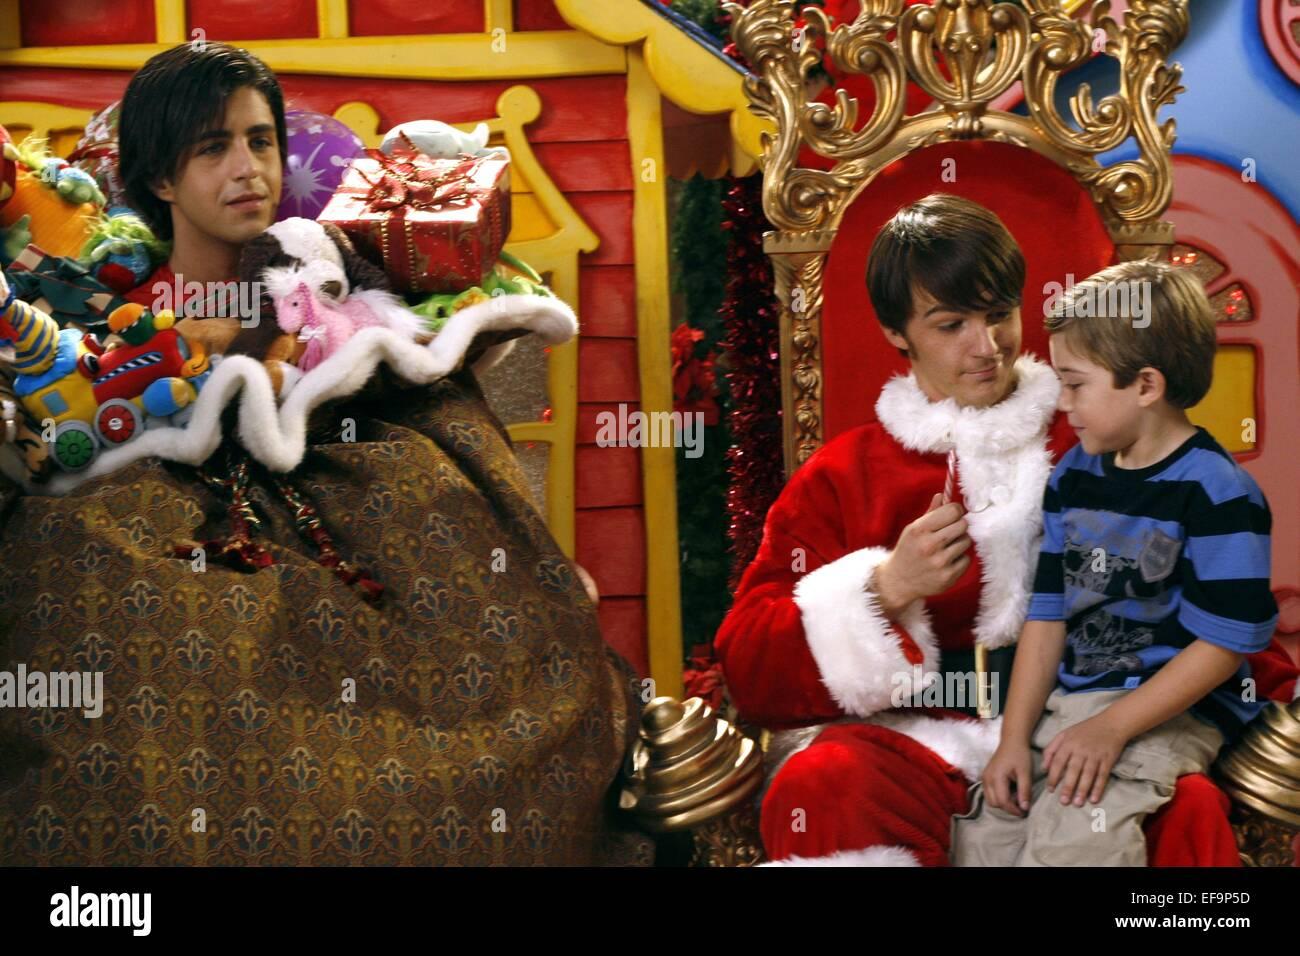 Frohe Weihnachten Drake Josh.Josh Peck Drake Bell Frohe Weihnachten Drake Josh 2008